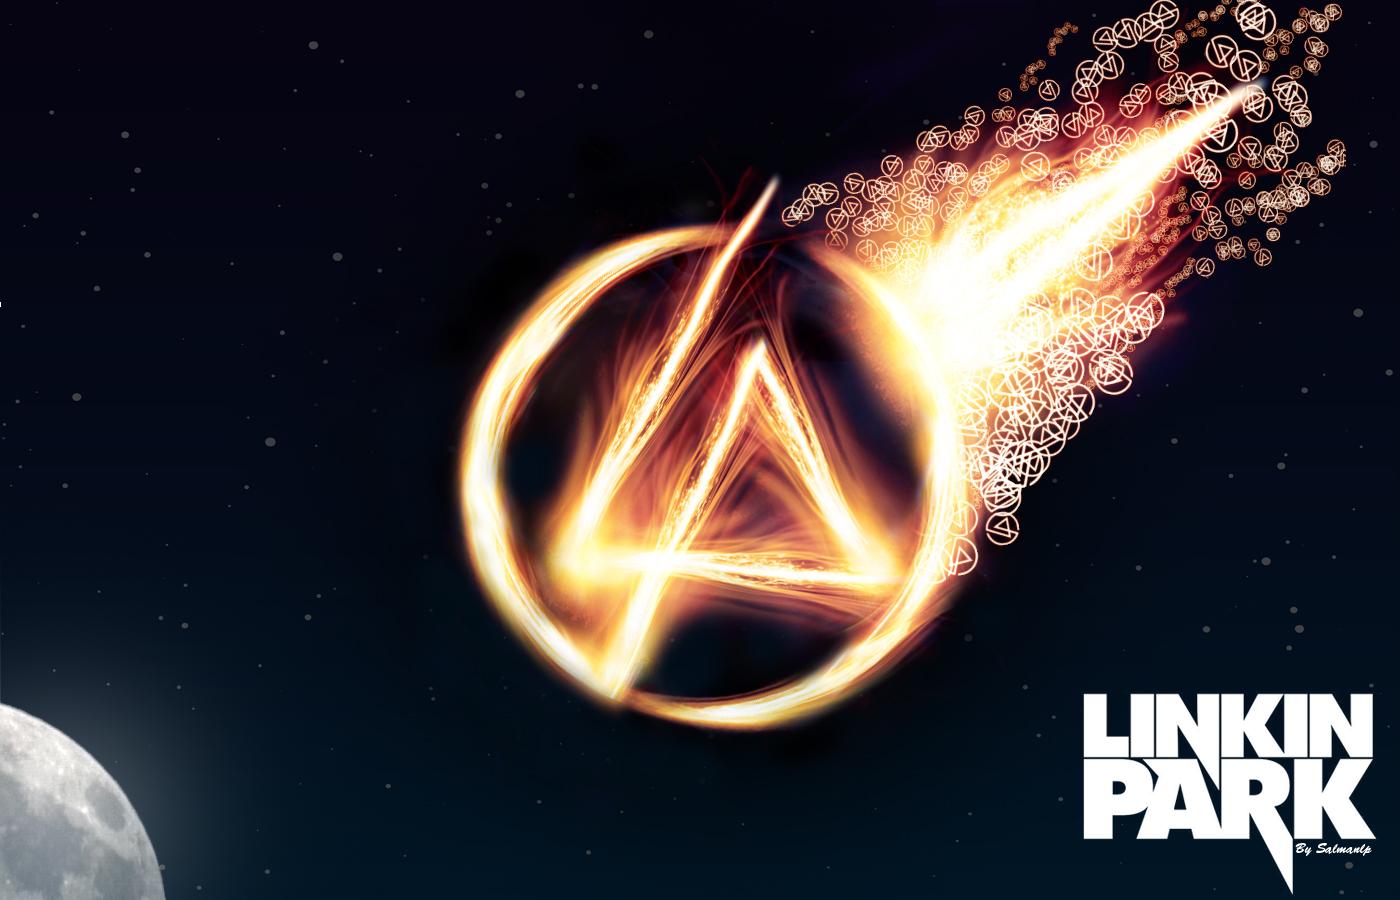 Linkin Park Logo Wallpaper By Salmanlp On Deviantart